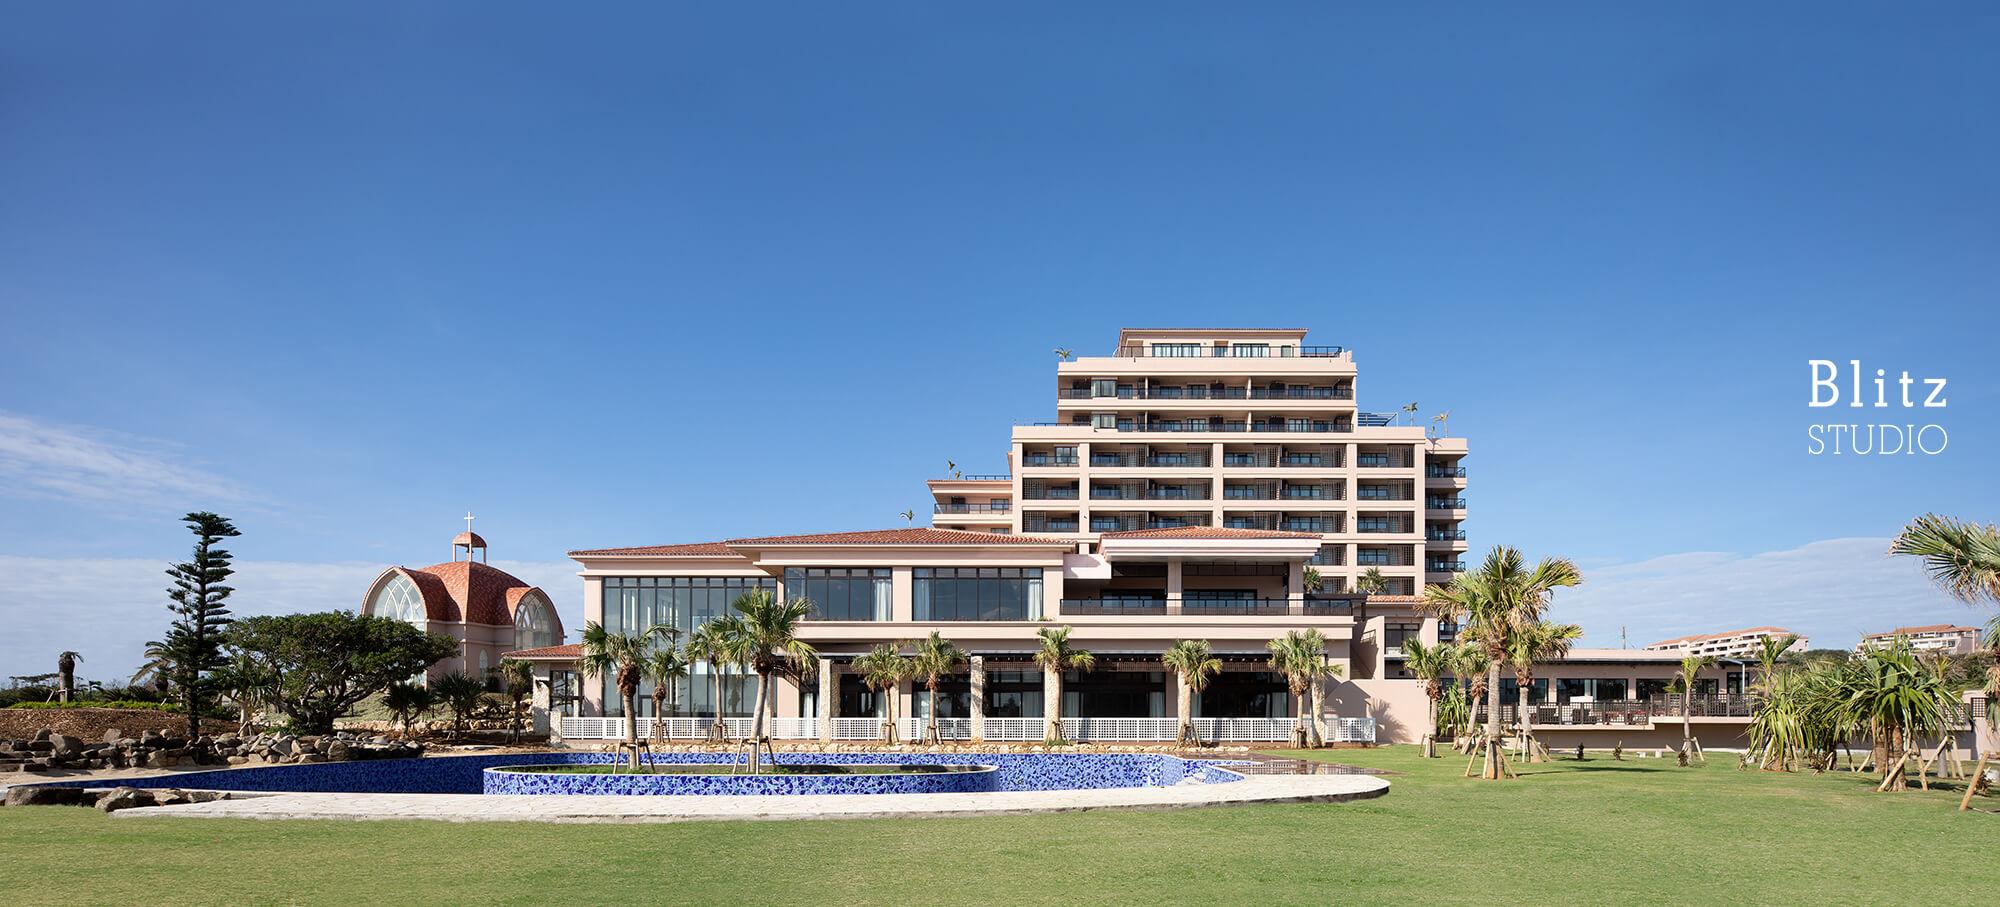 『HOTEL SHIGIRA MIRAGE BAYSIDE』-沖縄県宮古島市-建築写真・竣工写真・インテリア写真4